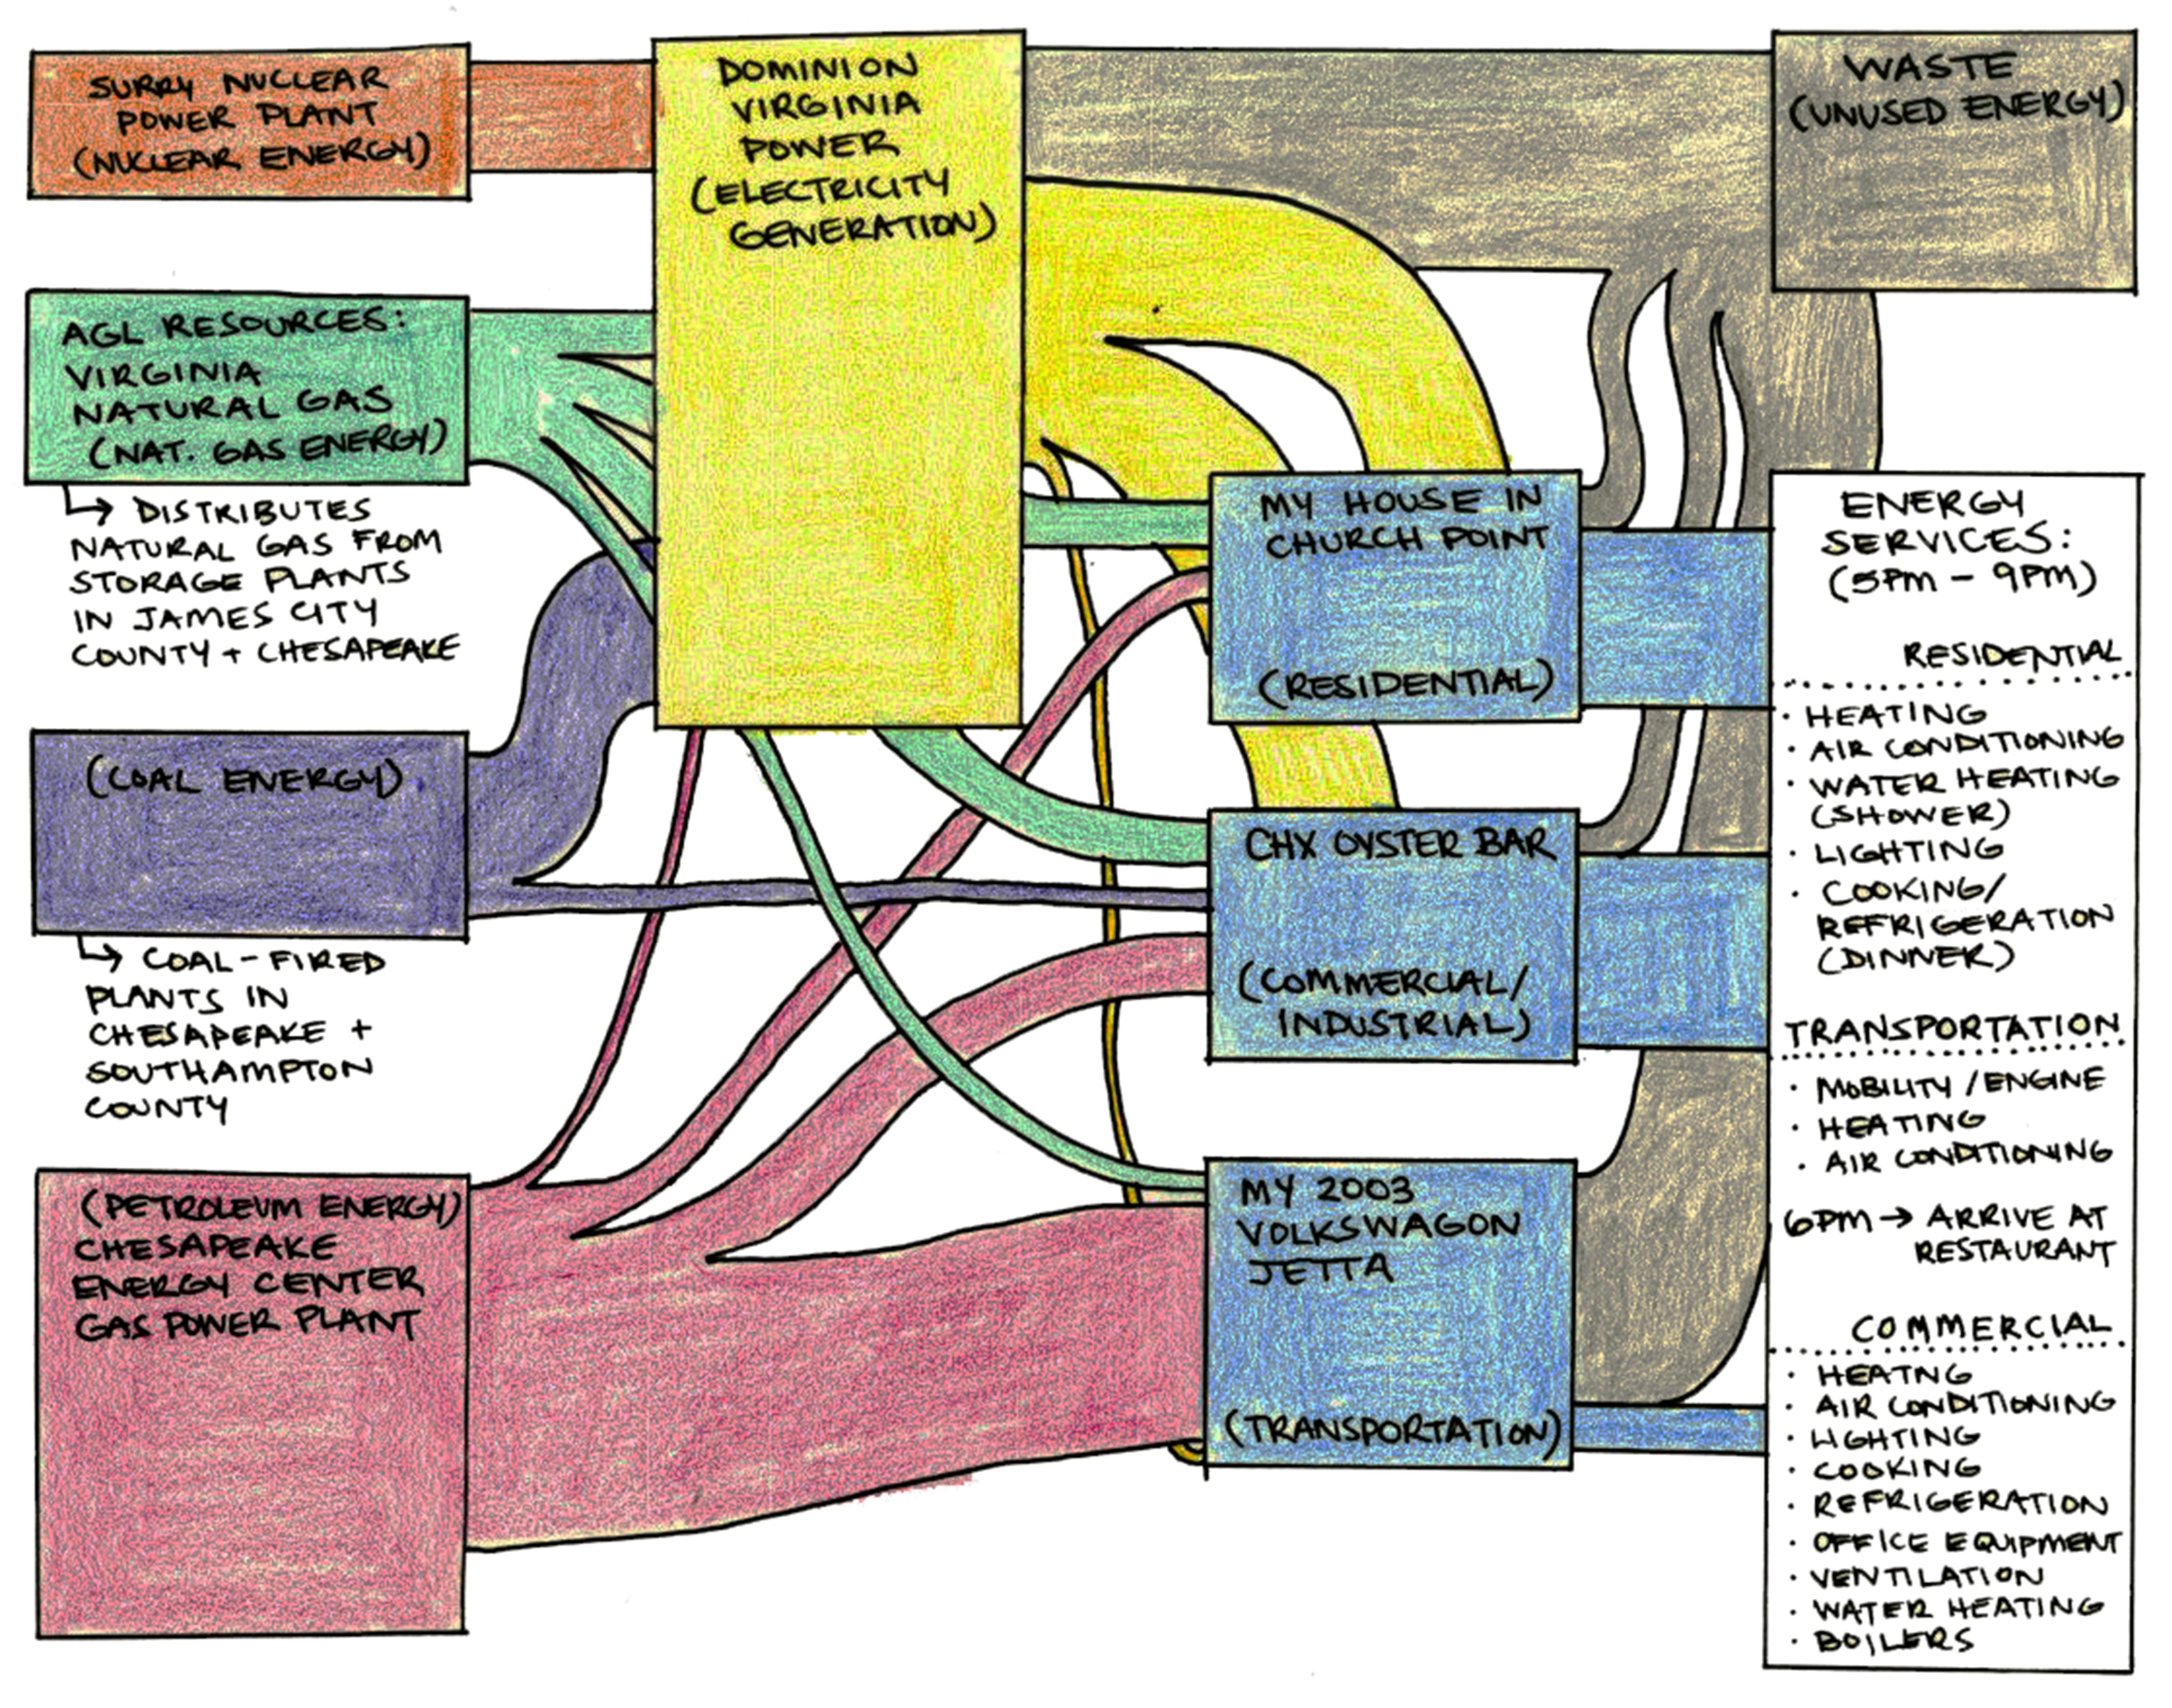 Systemic Energy Distribution Architecture Portfolio Natural Gas Power Plant Diagram Dominion Virginia Handles Electricity Generation